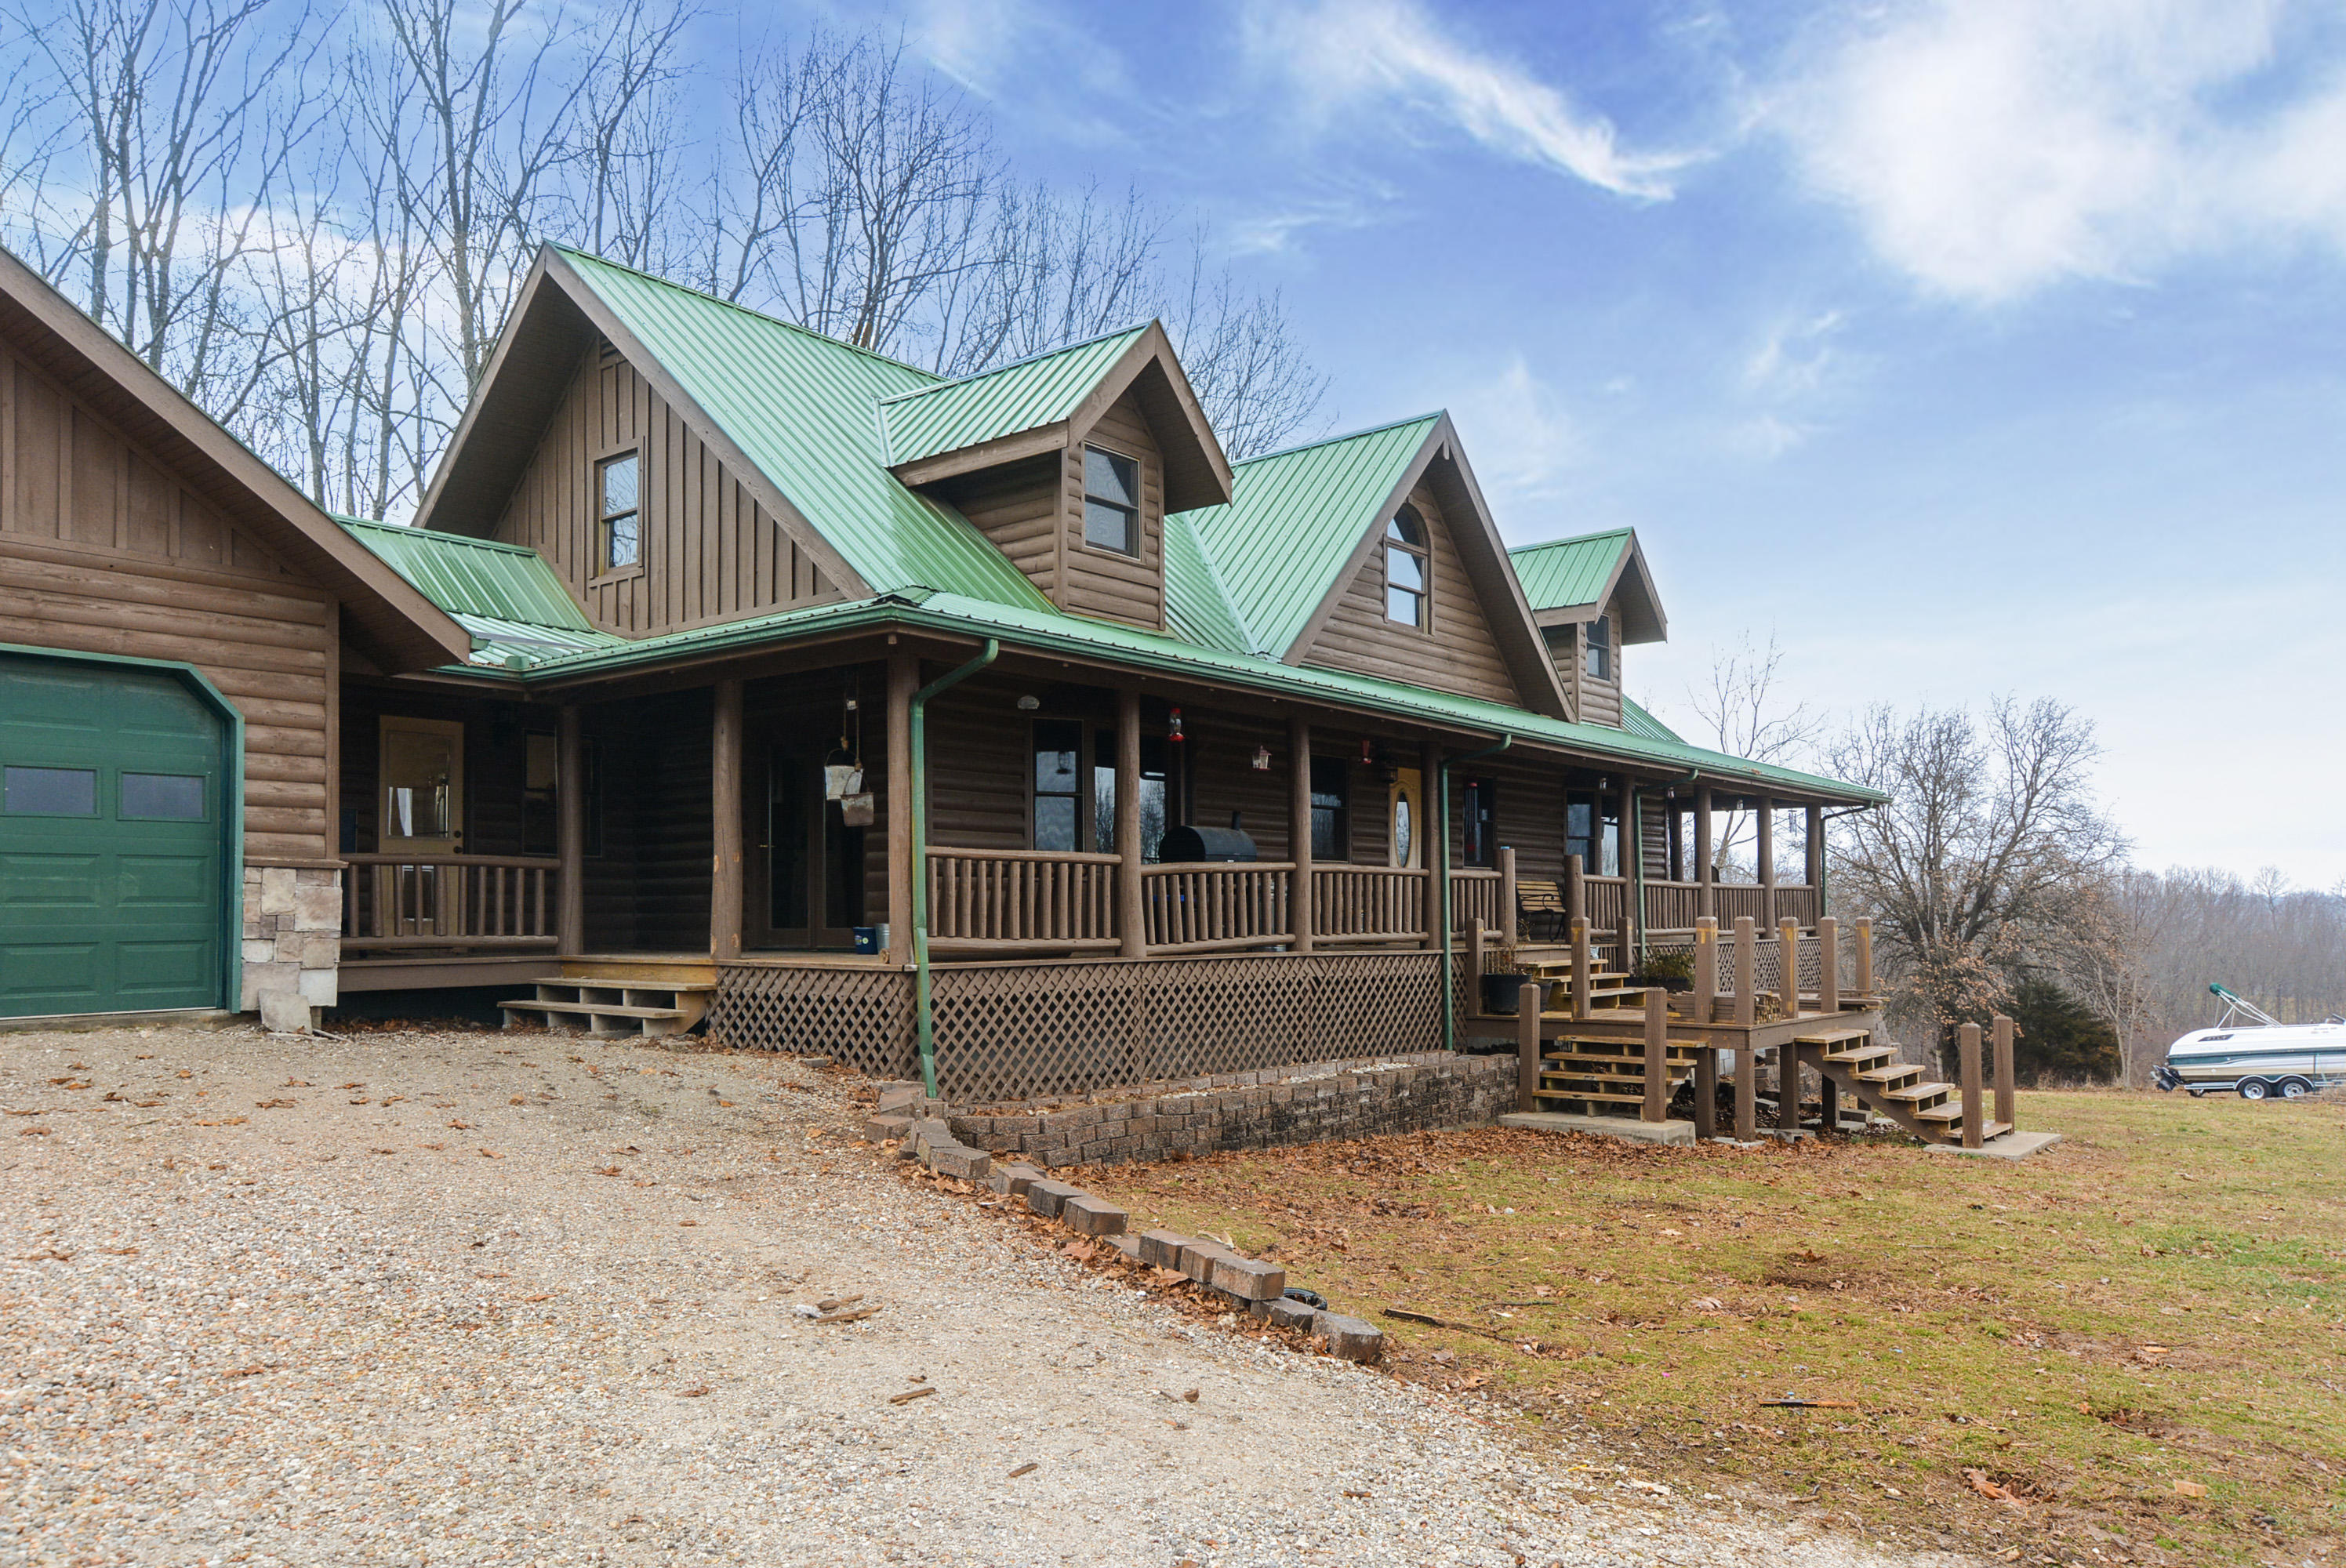 13915 Farm Road Cassville, MO 65625